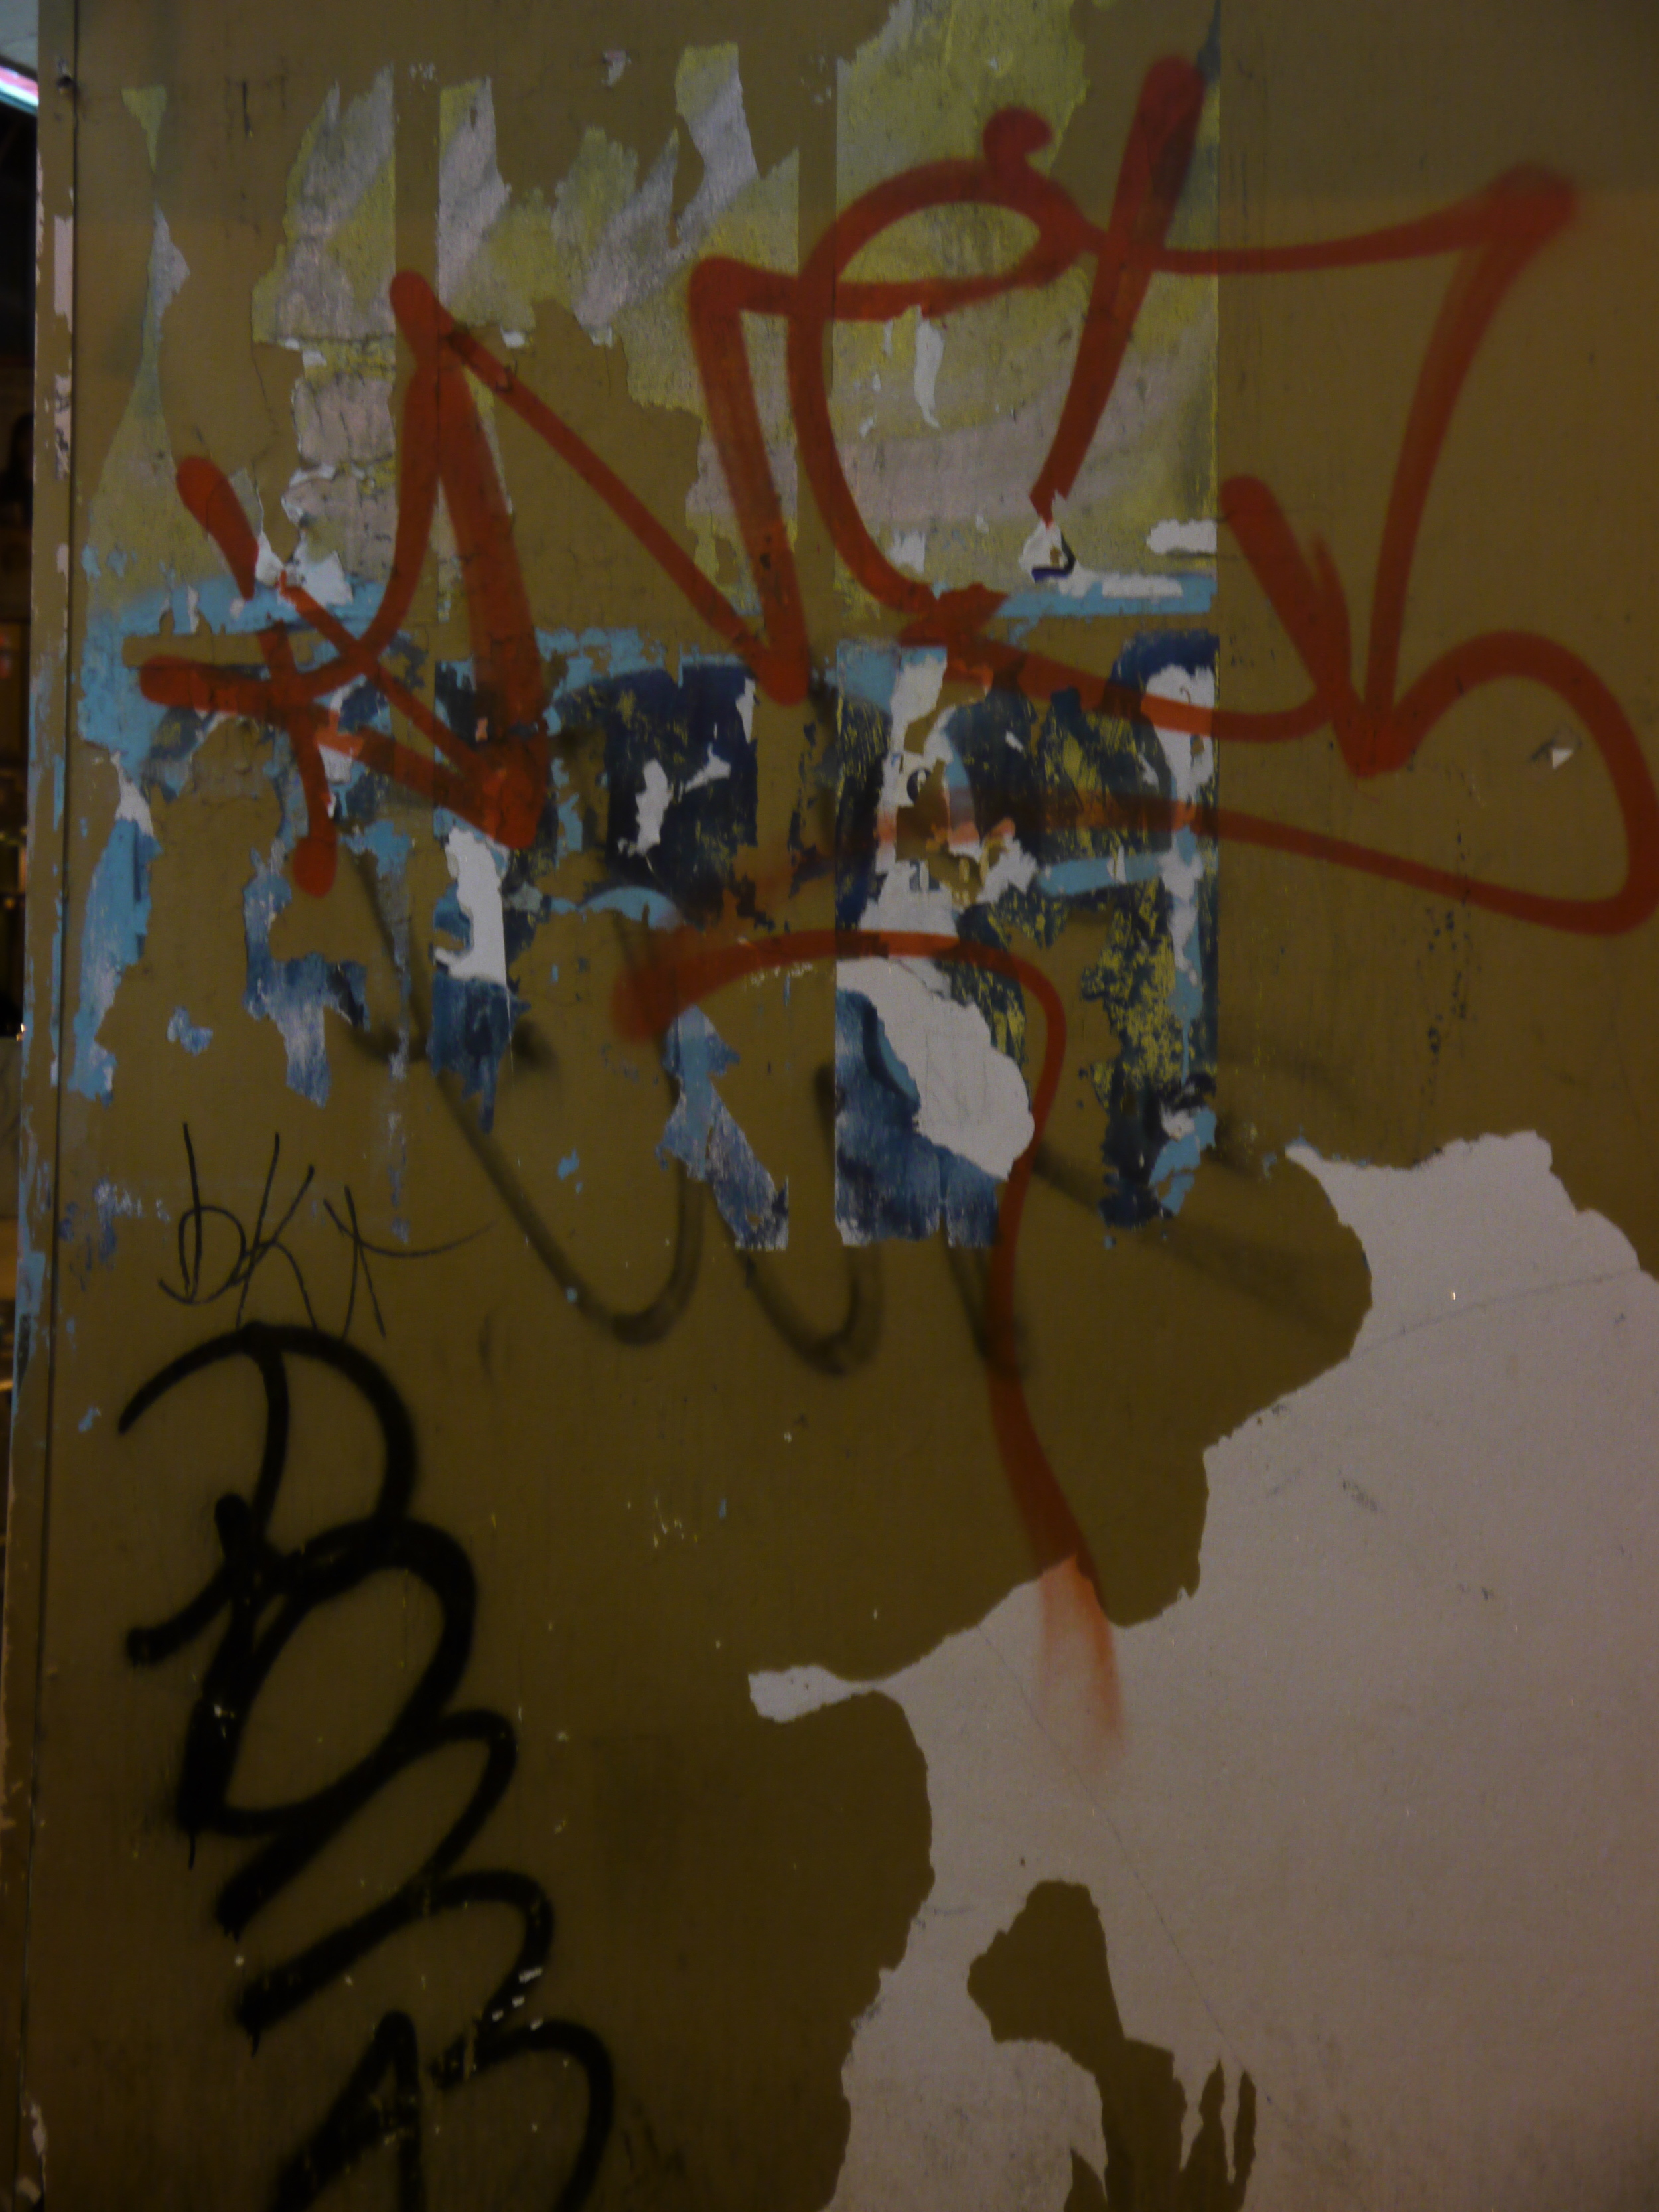 grafitti at night.JPG